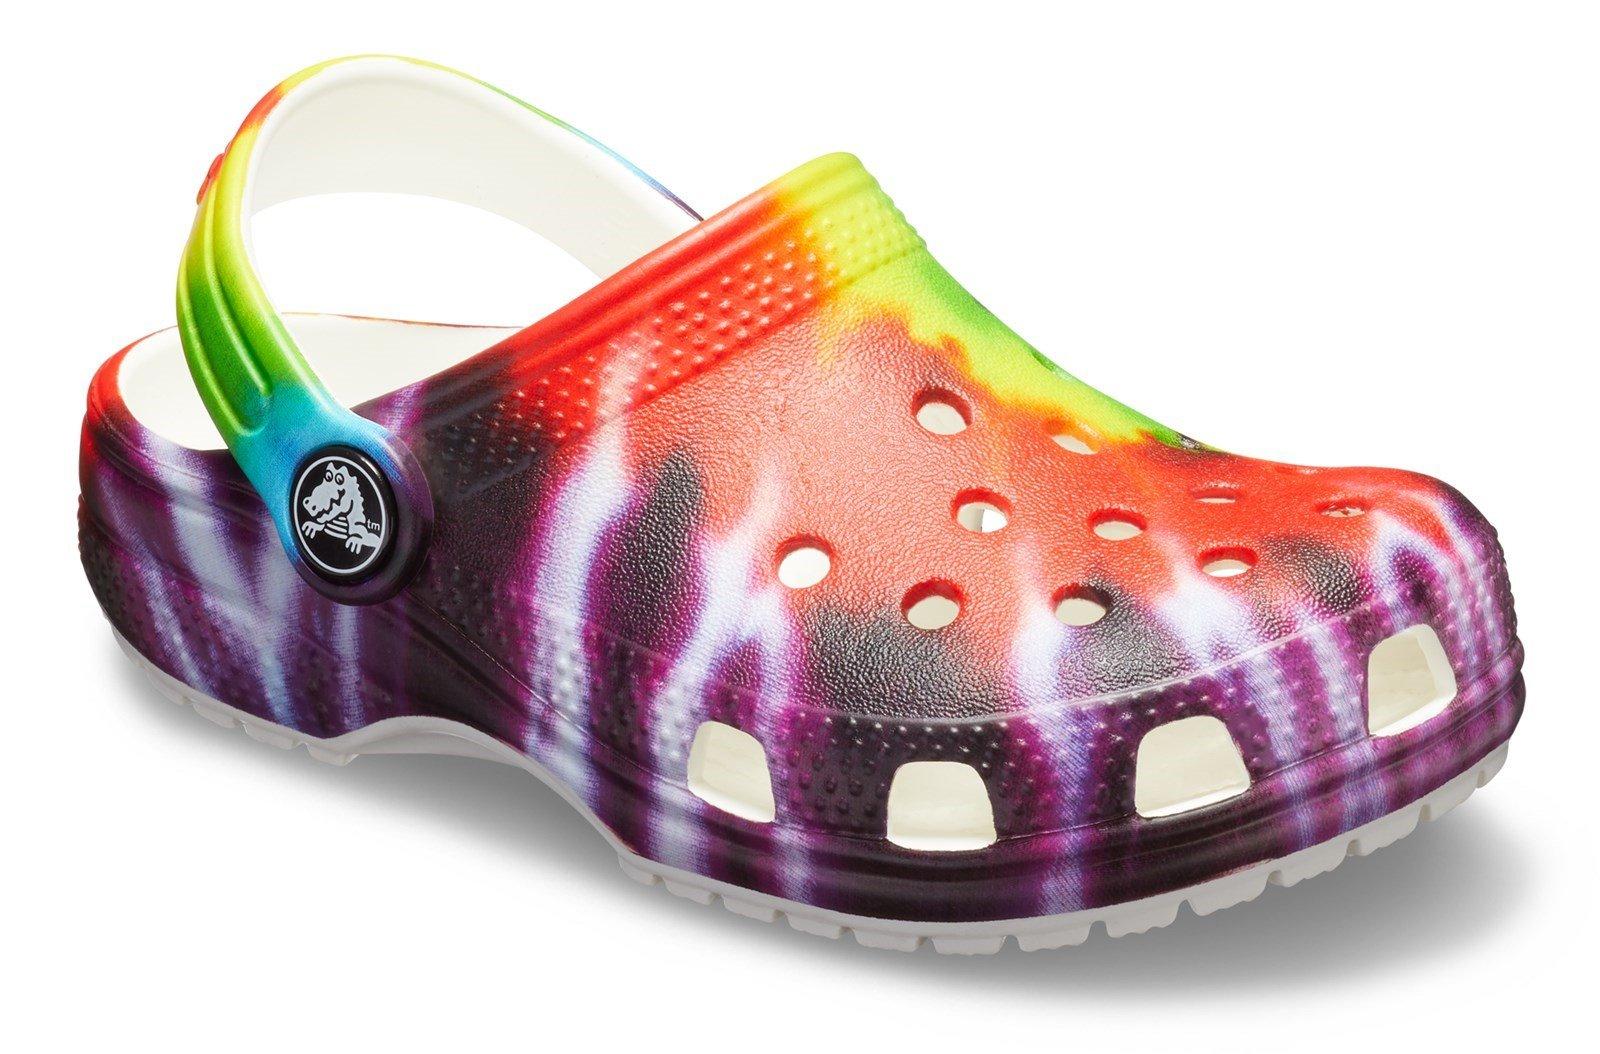 Crocs Kid's Classic Tie Dye Graphic Clog Sandal Multicolor 31875 - Multi 4